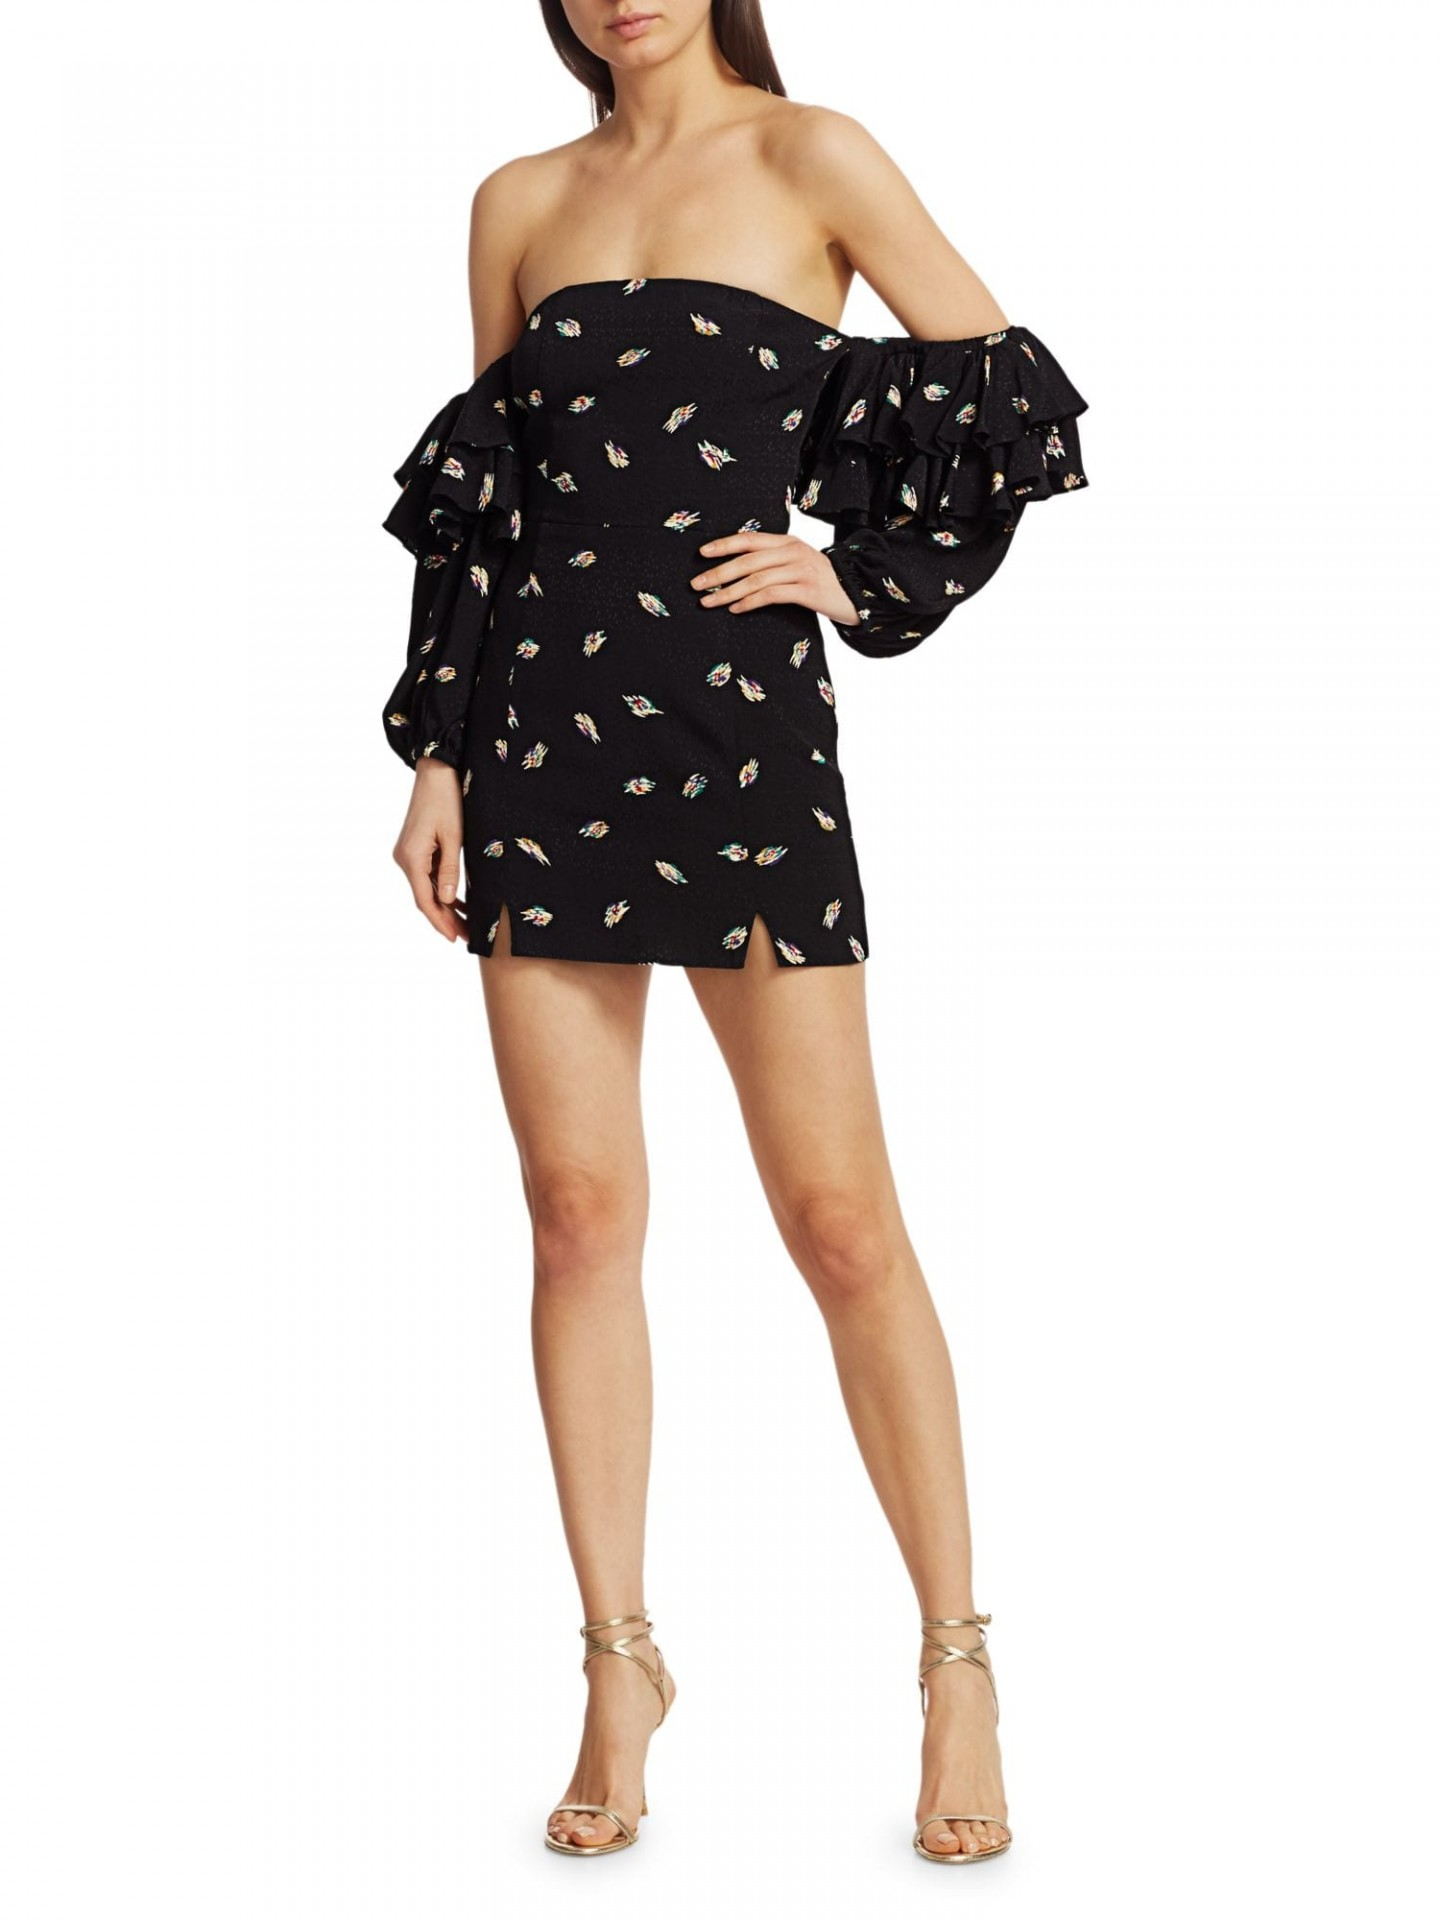 ROTATE BIRGER CHRISTENSEN Bethany Floral Off-the-Shoulder Tier-Ruffle Mini Sheath Dress